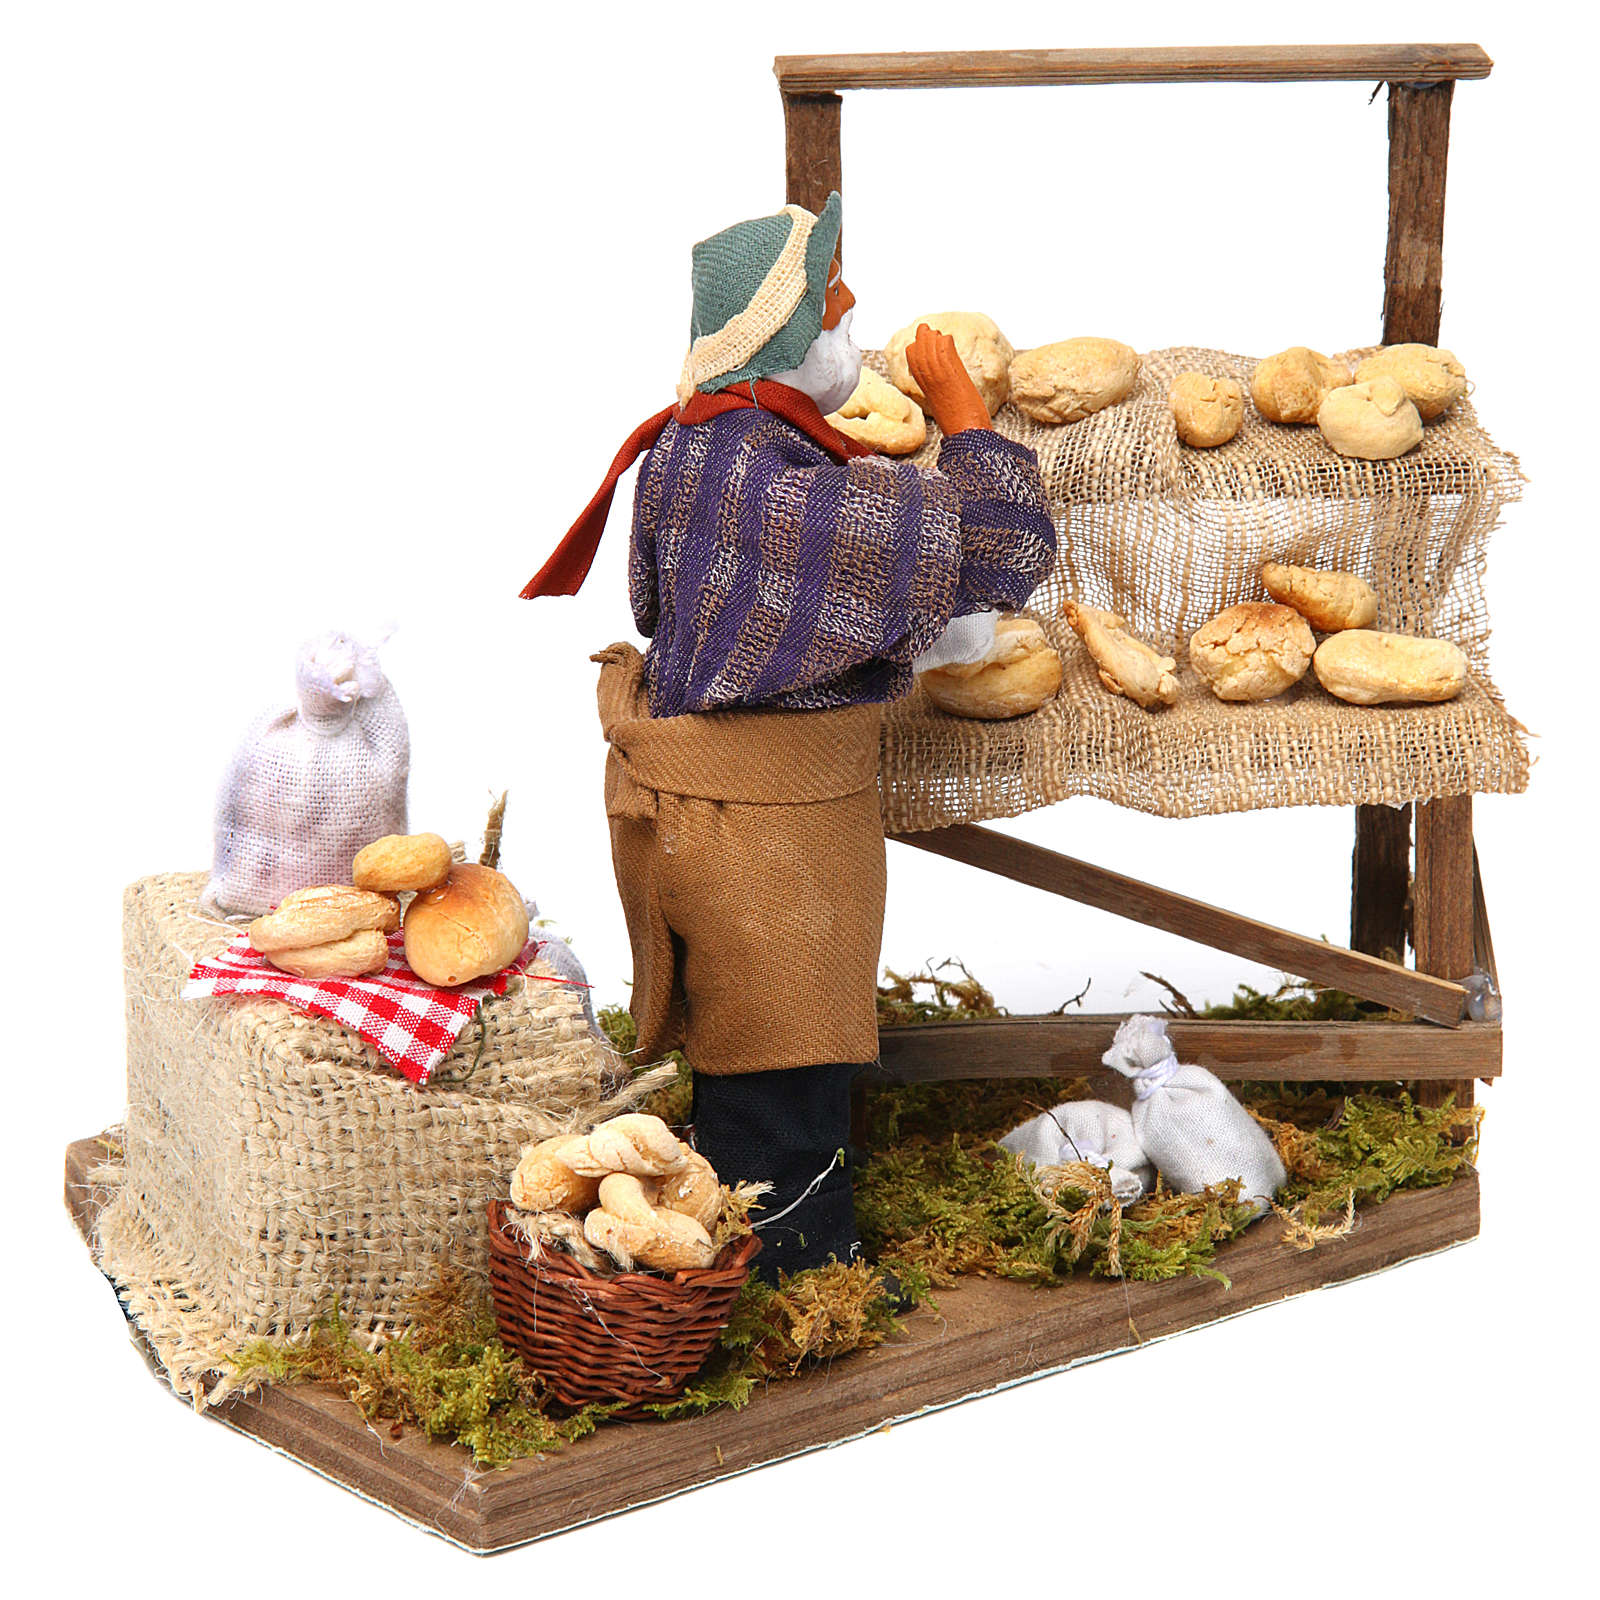 Animated nativity scene, bread seller 12 cm 4